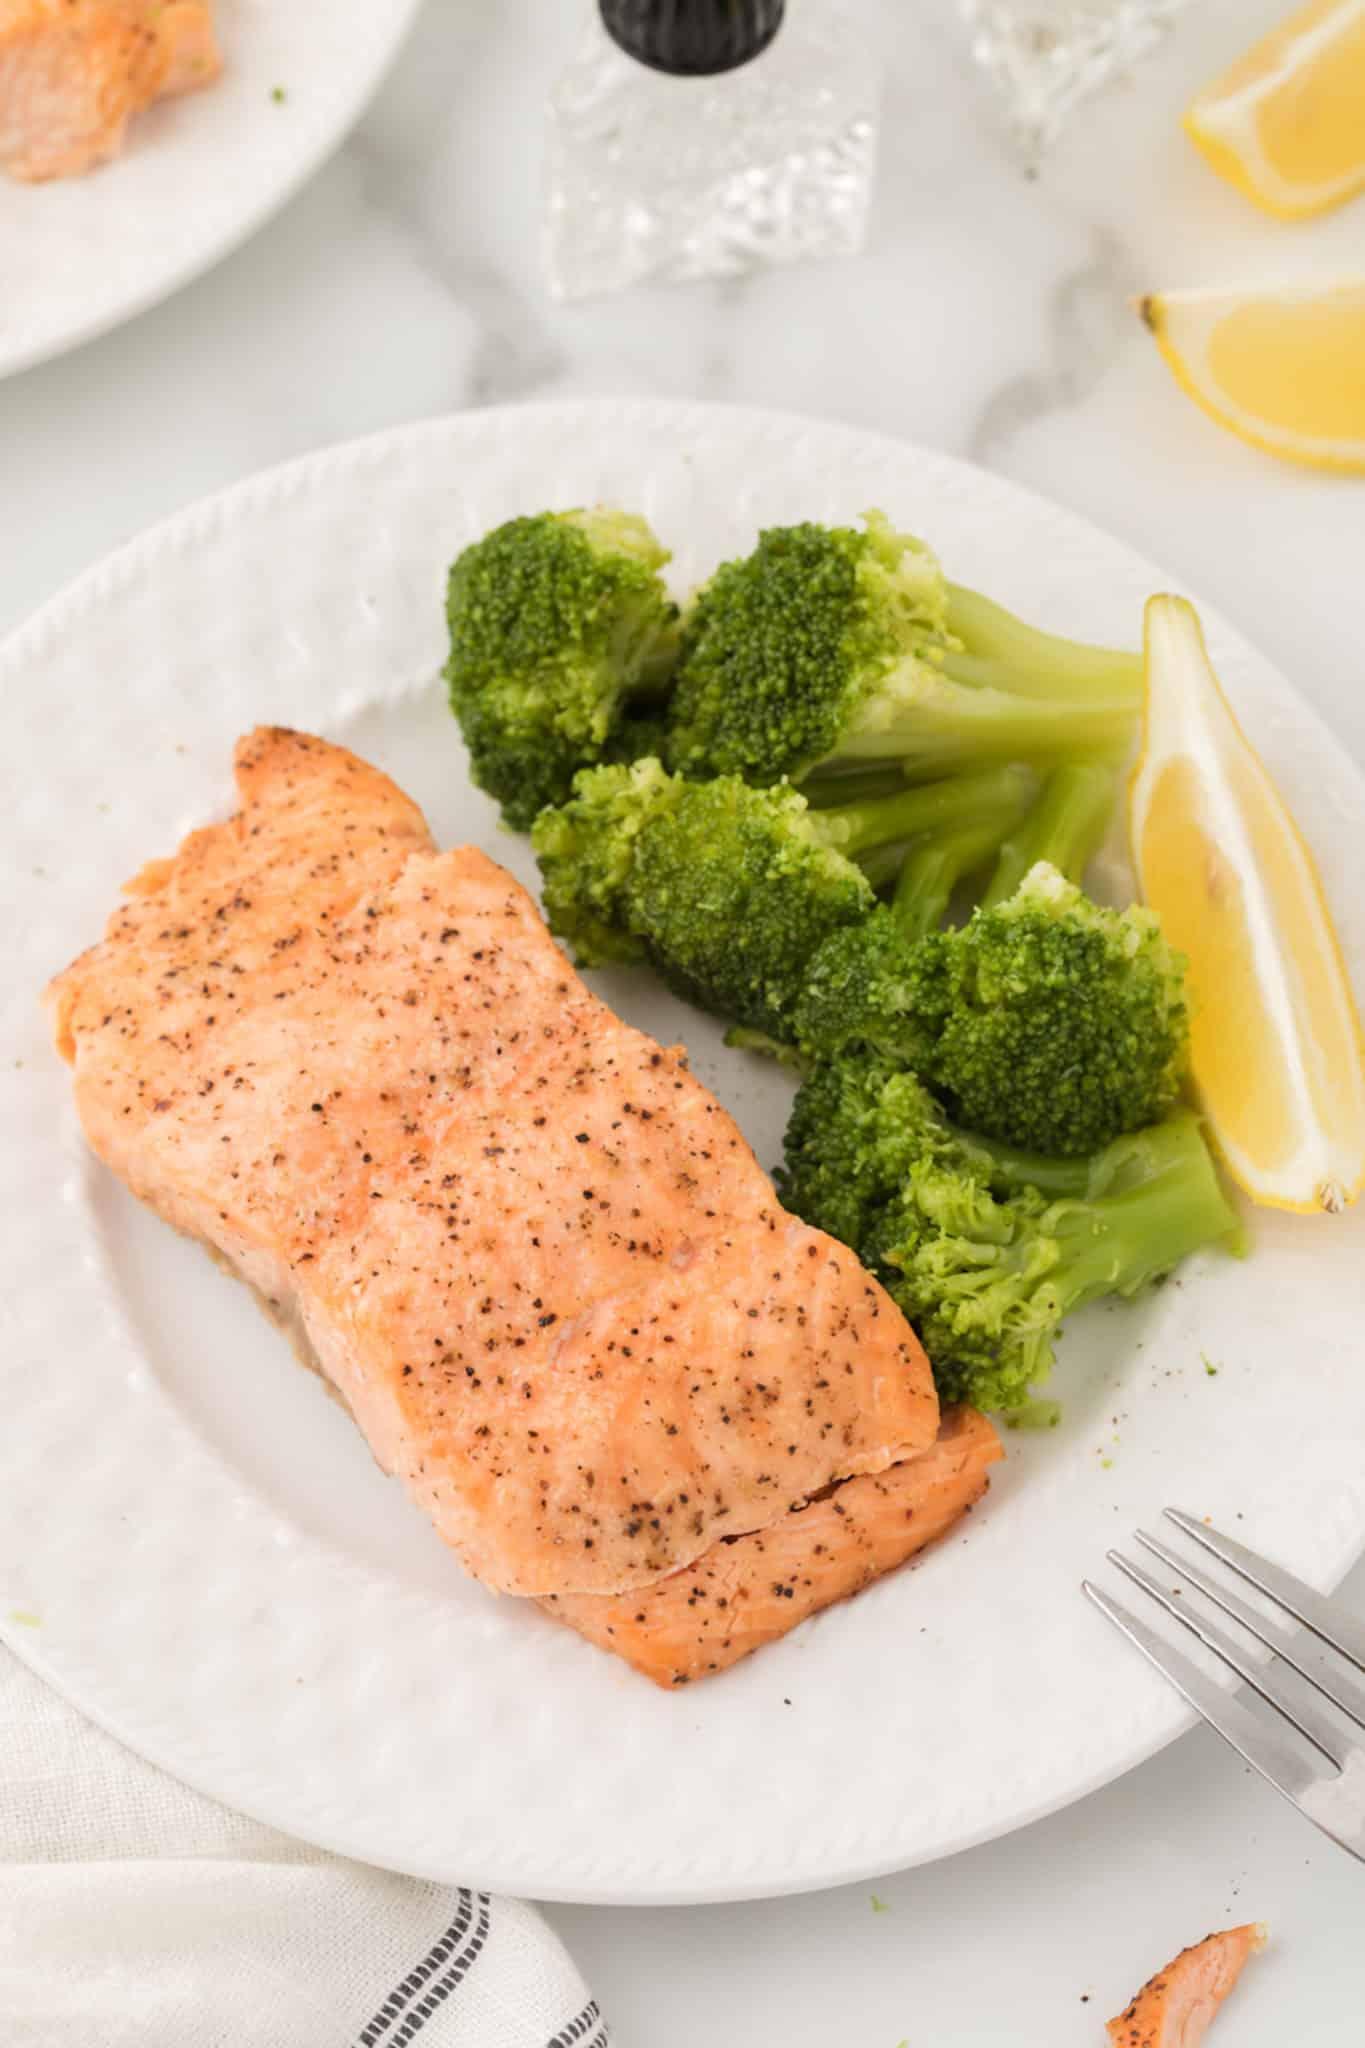 Salmon with broccoli